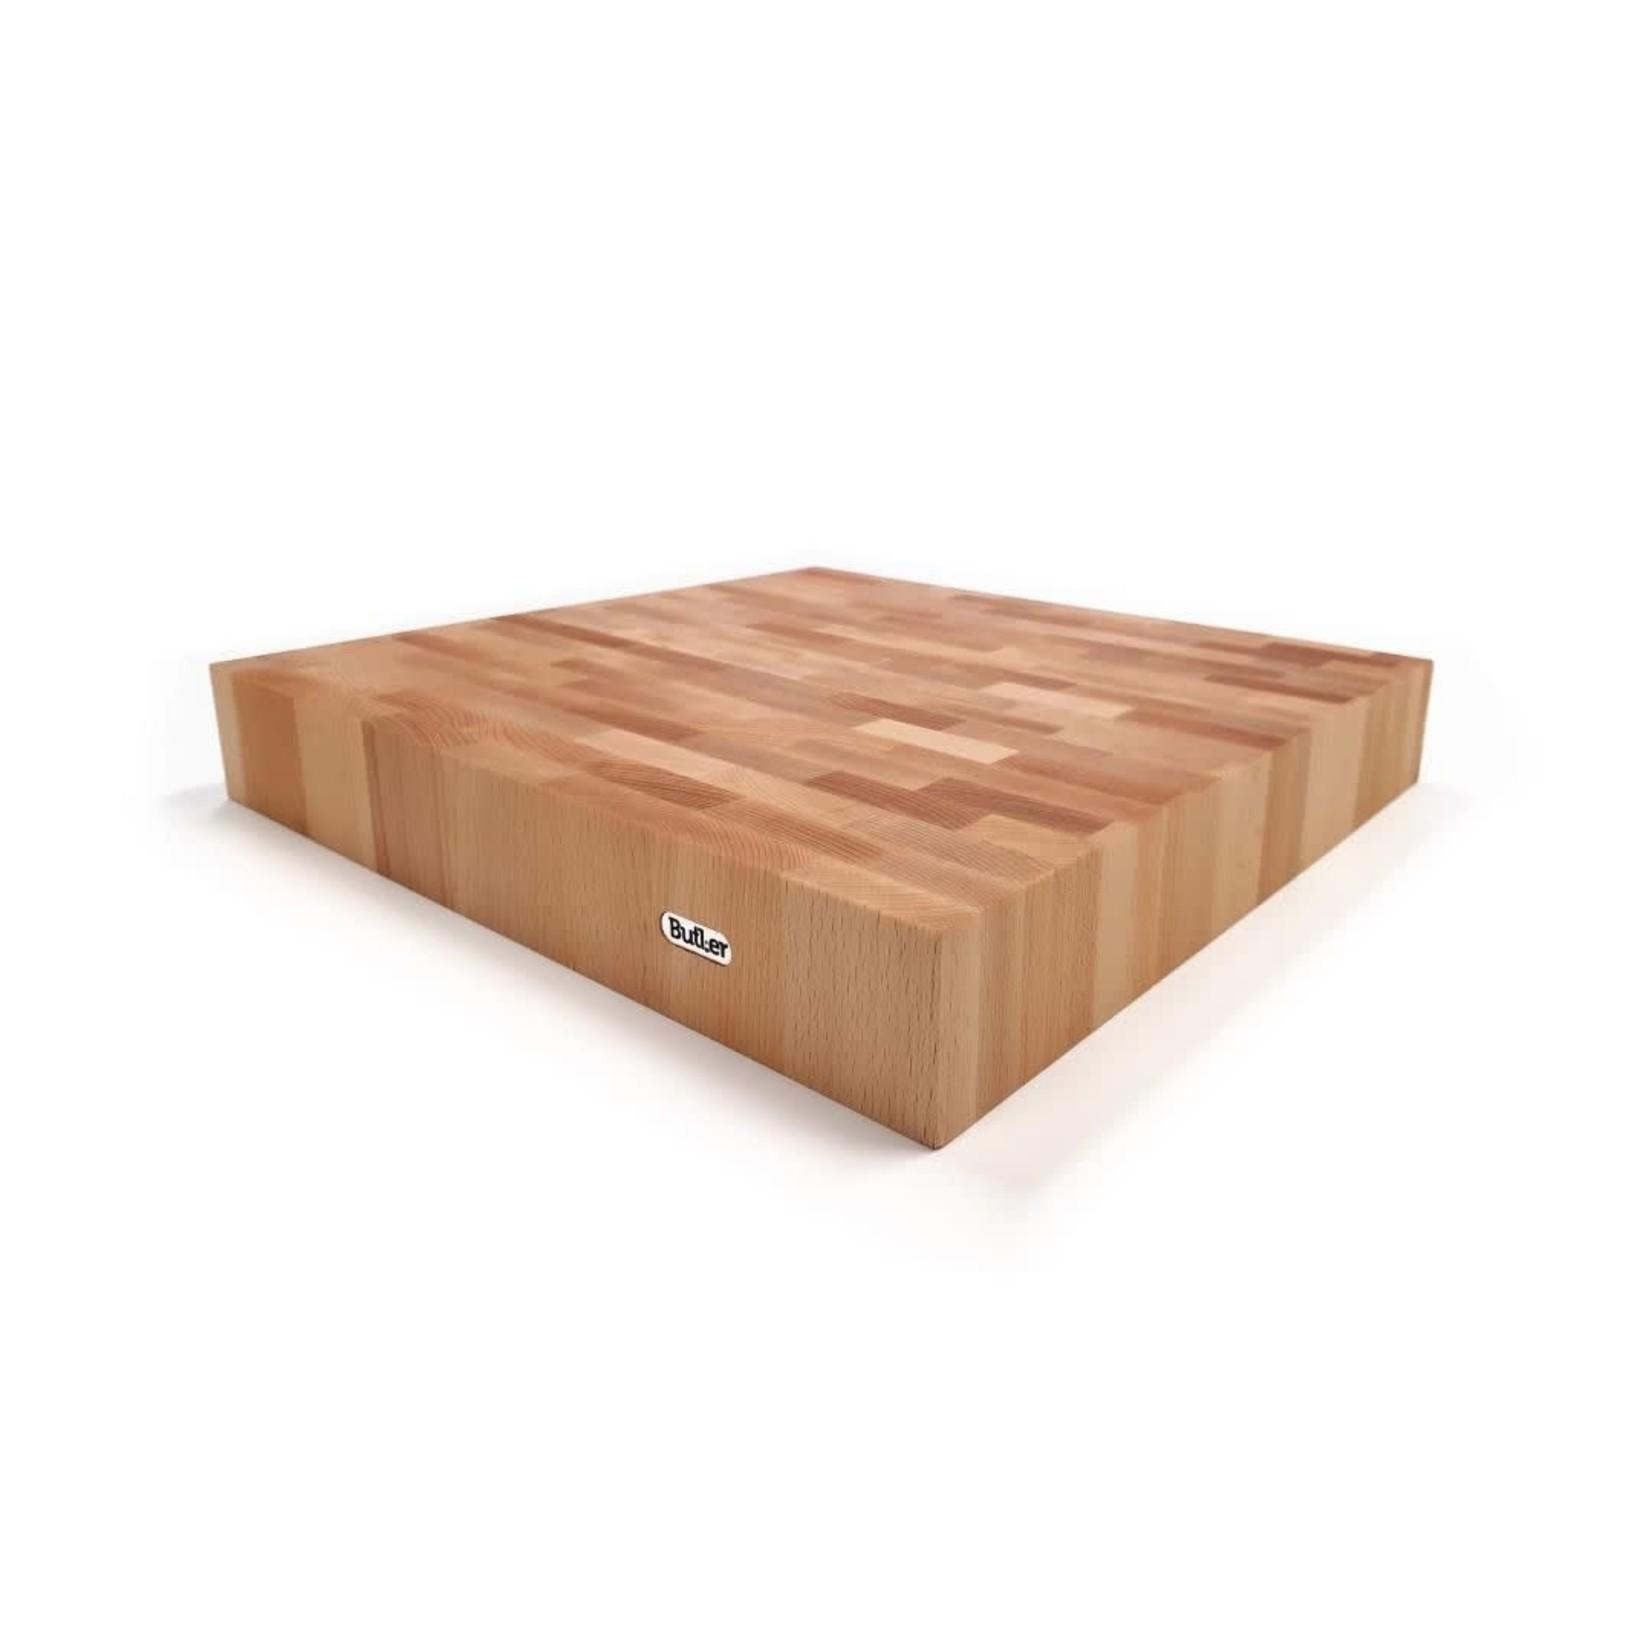 Hakblok beuken 40x40x6cm